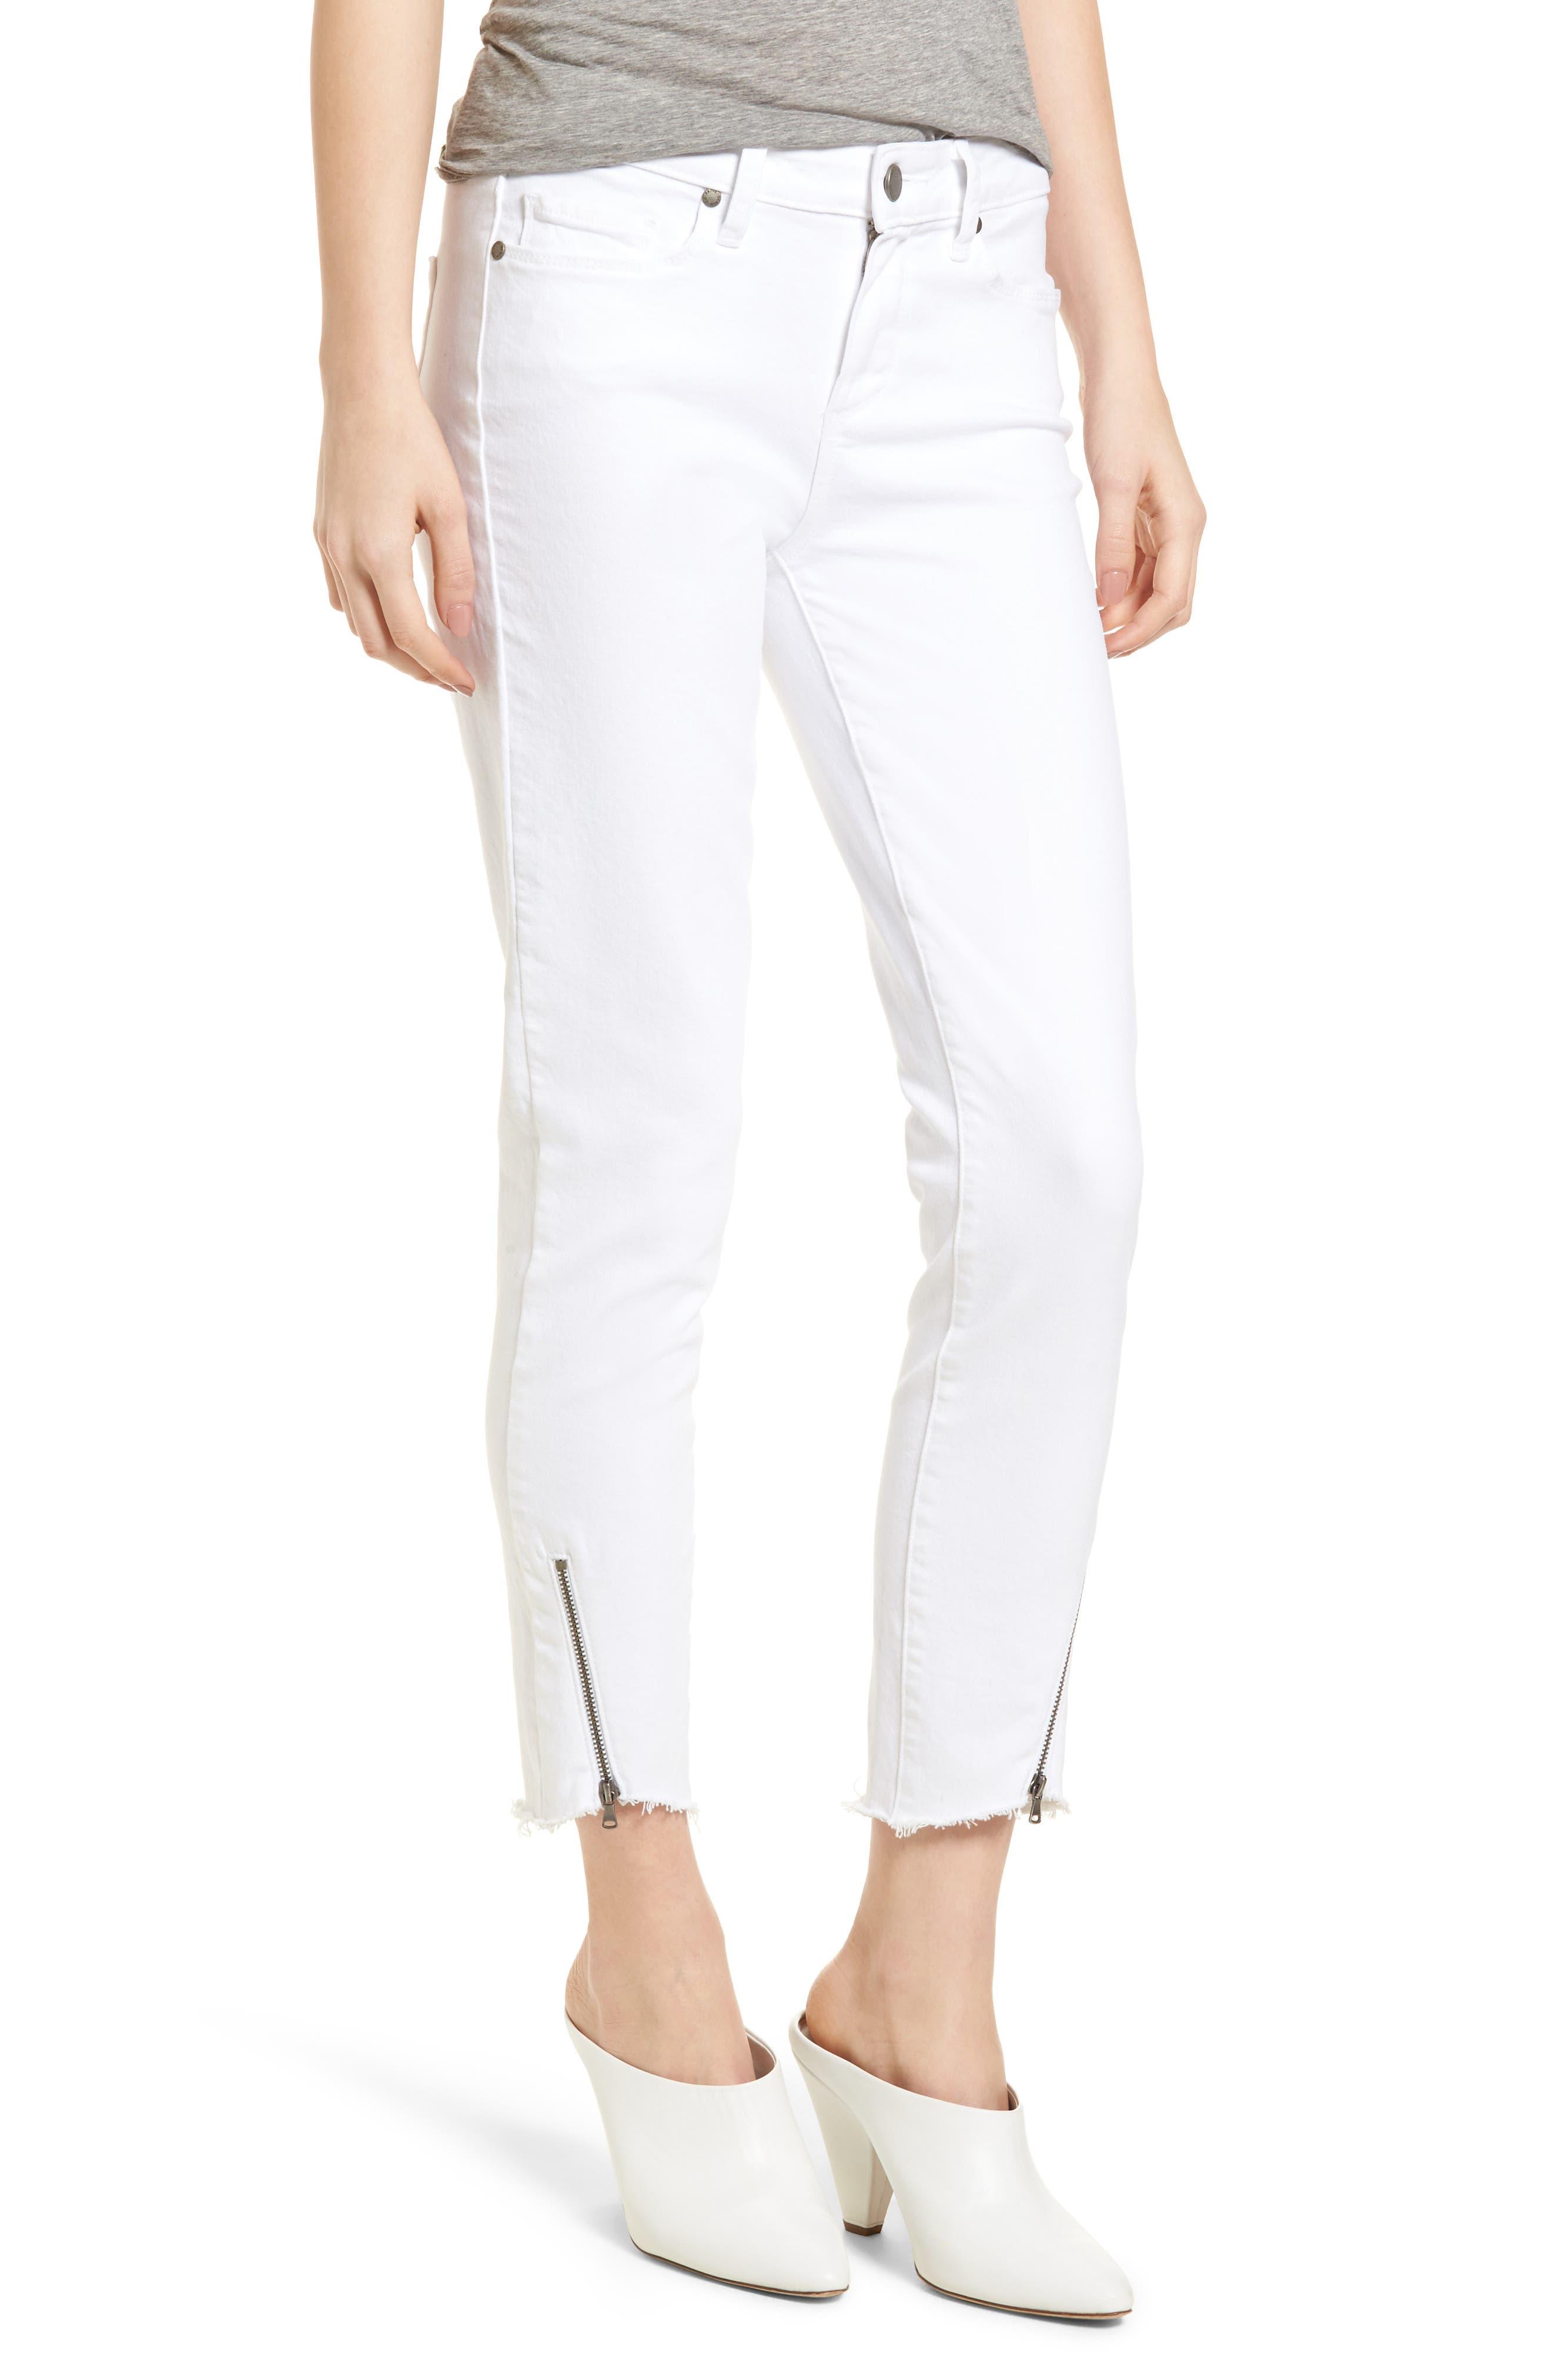 Verdugo Crop Ultra Skinny Jeans,                         Main,                         color, Crisp White